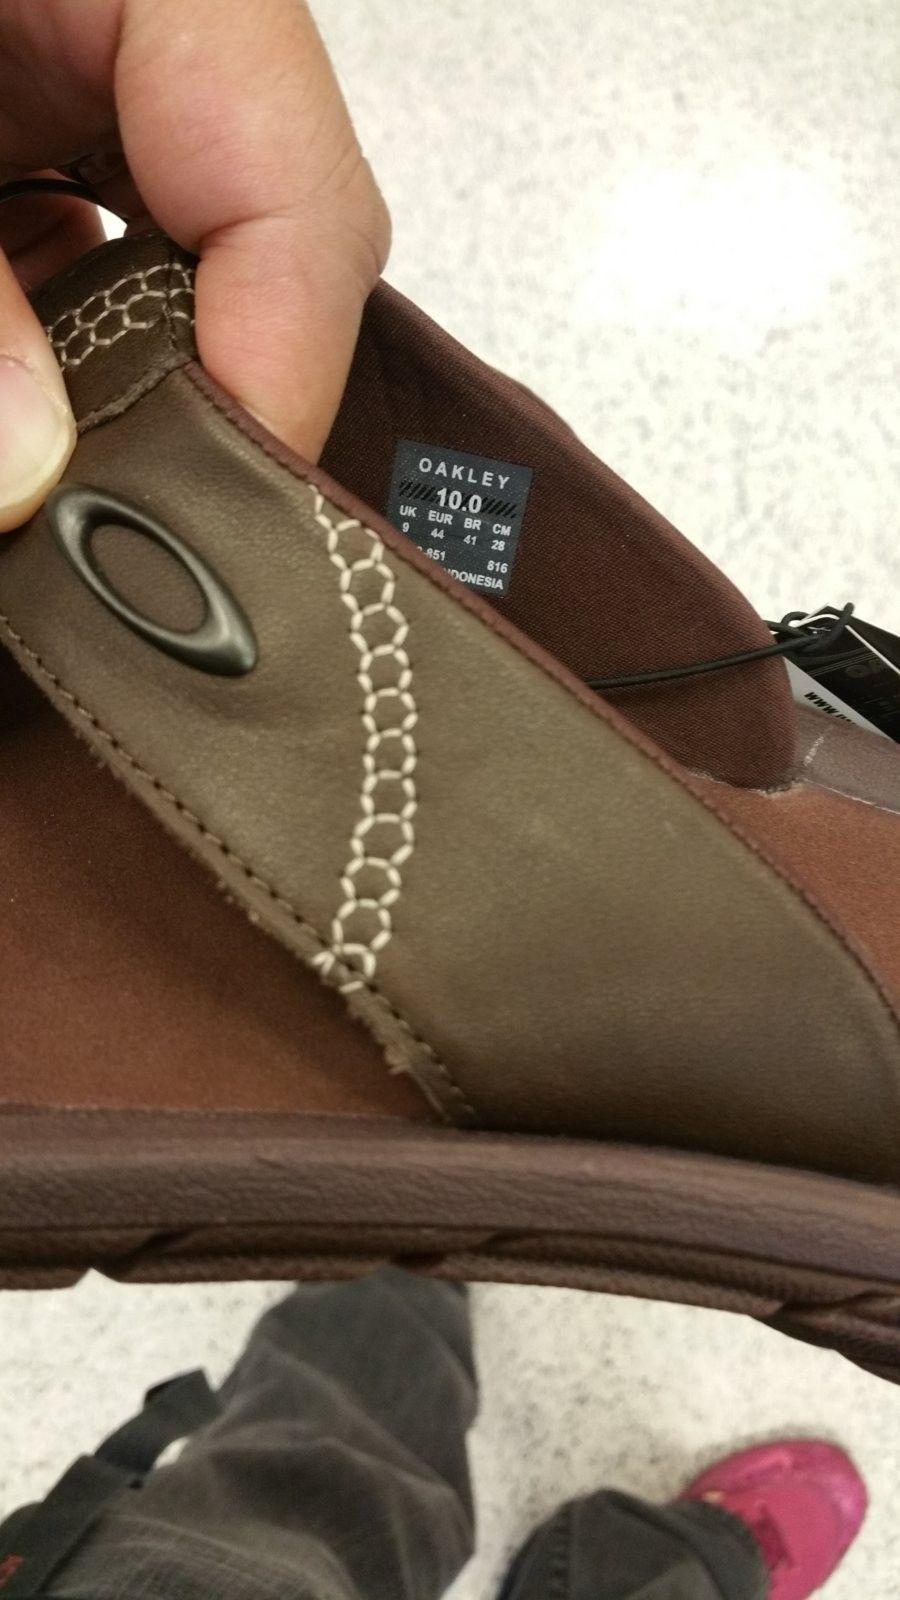 Oakley sandal brown - 20161013_121714.jpg